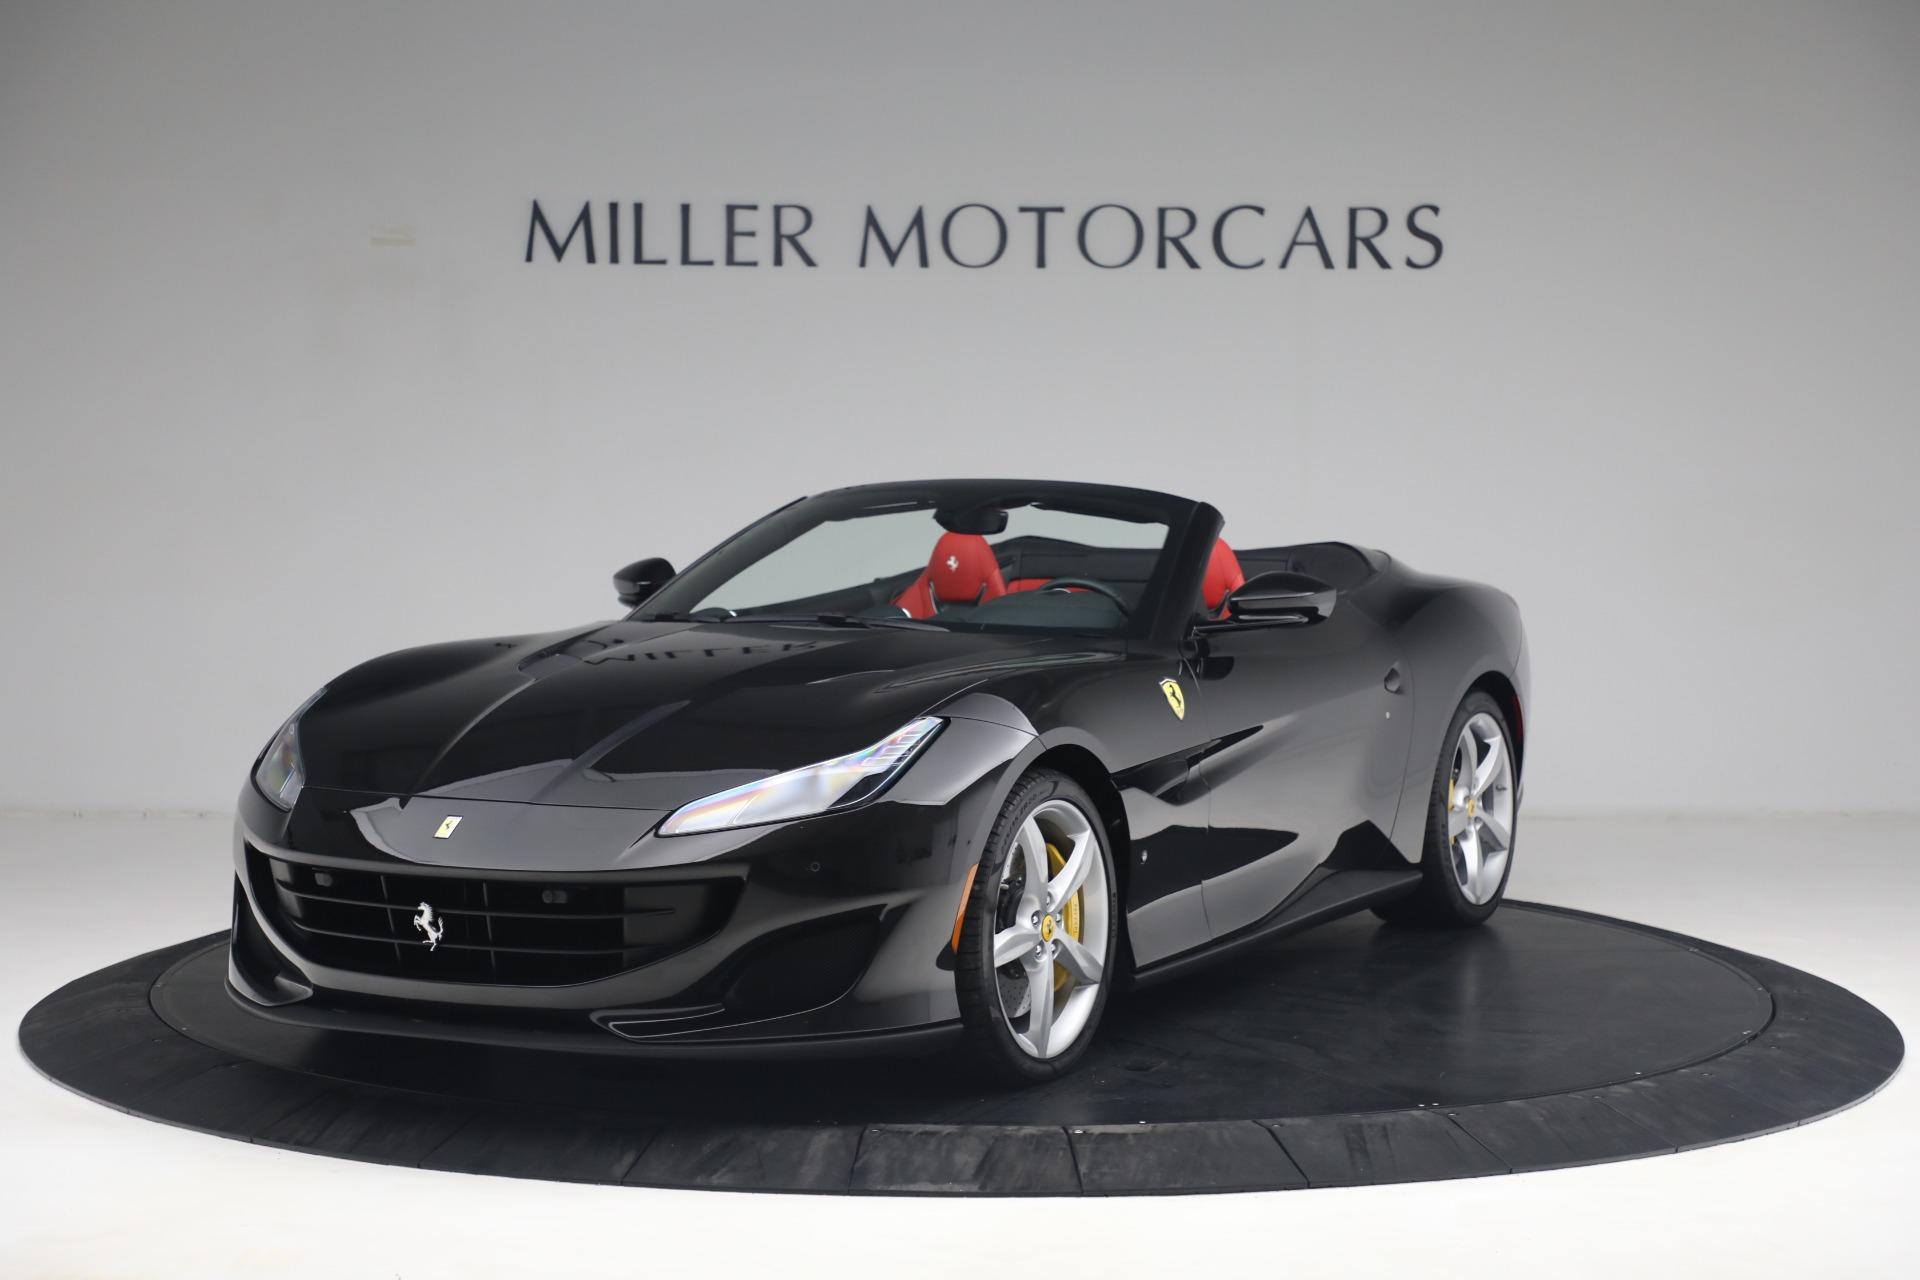 Used 2019 Ferrari Portofino for sale $245,900 at Rolls-Royce Motor Cars Greenwich in Greenwich CT 06830 1